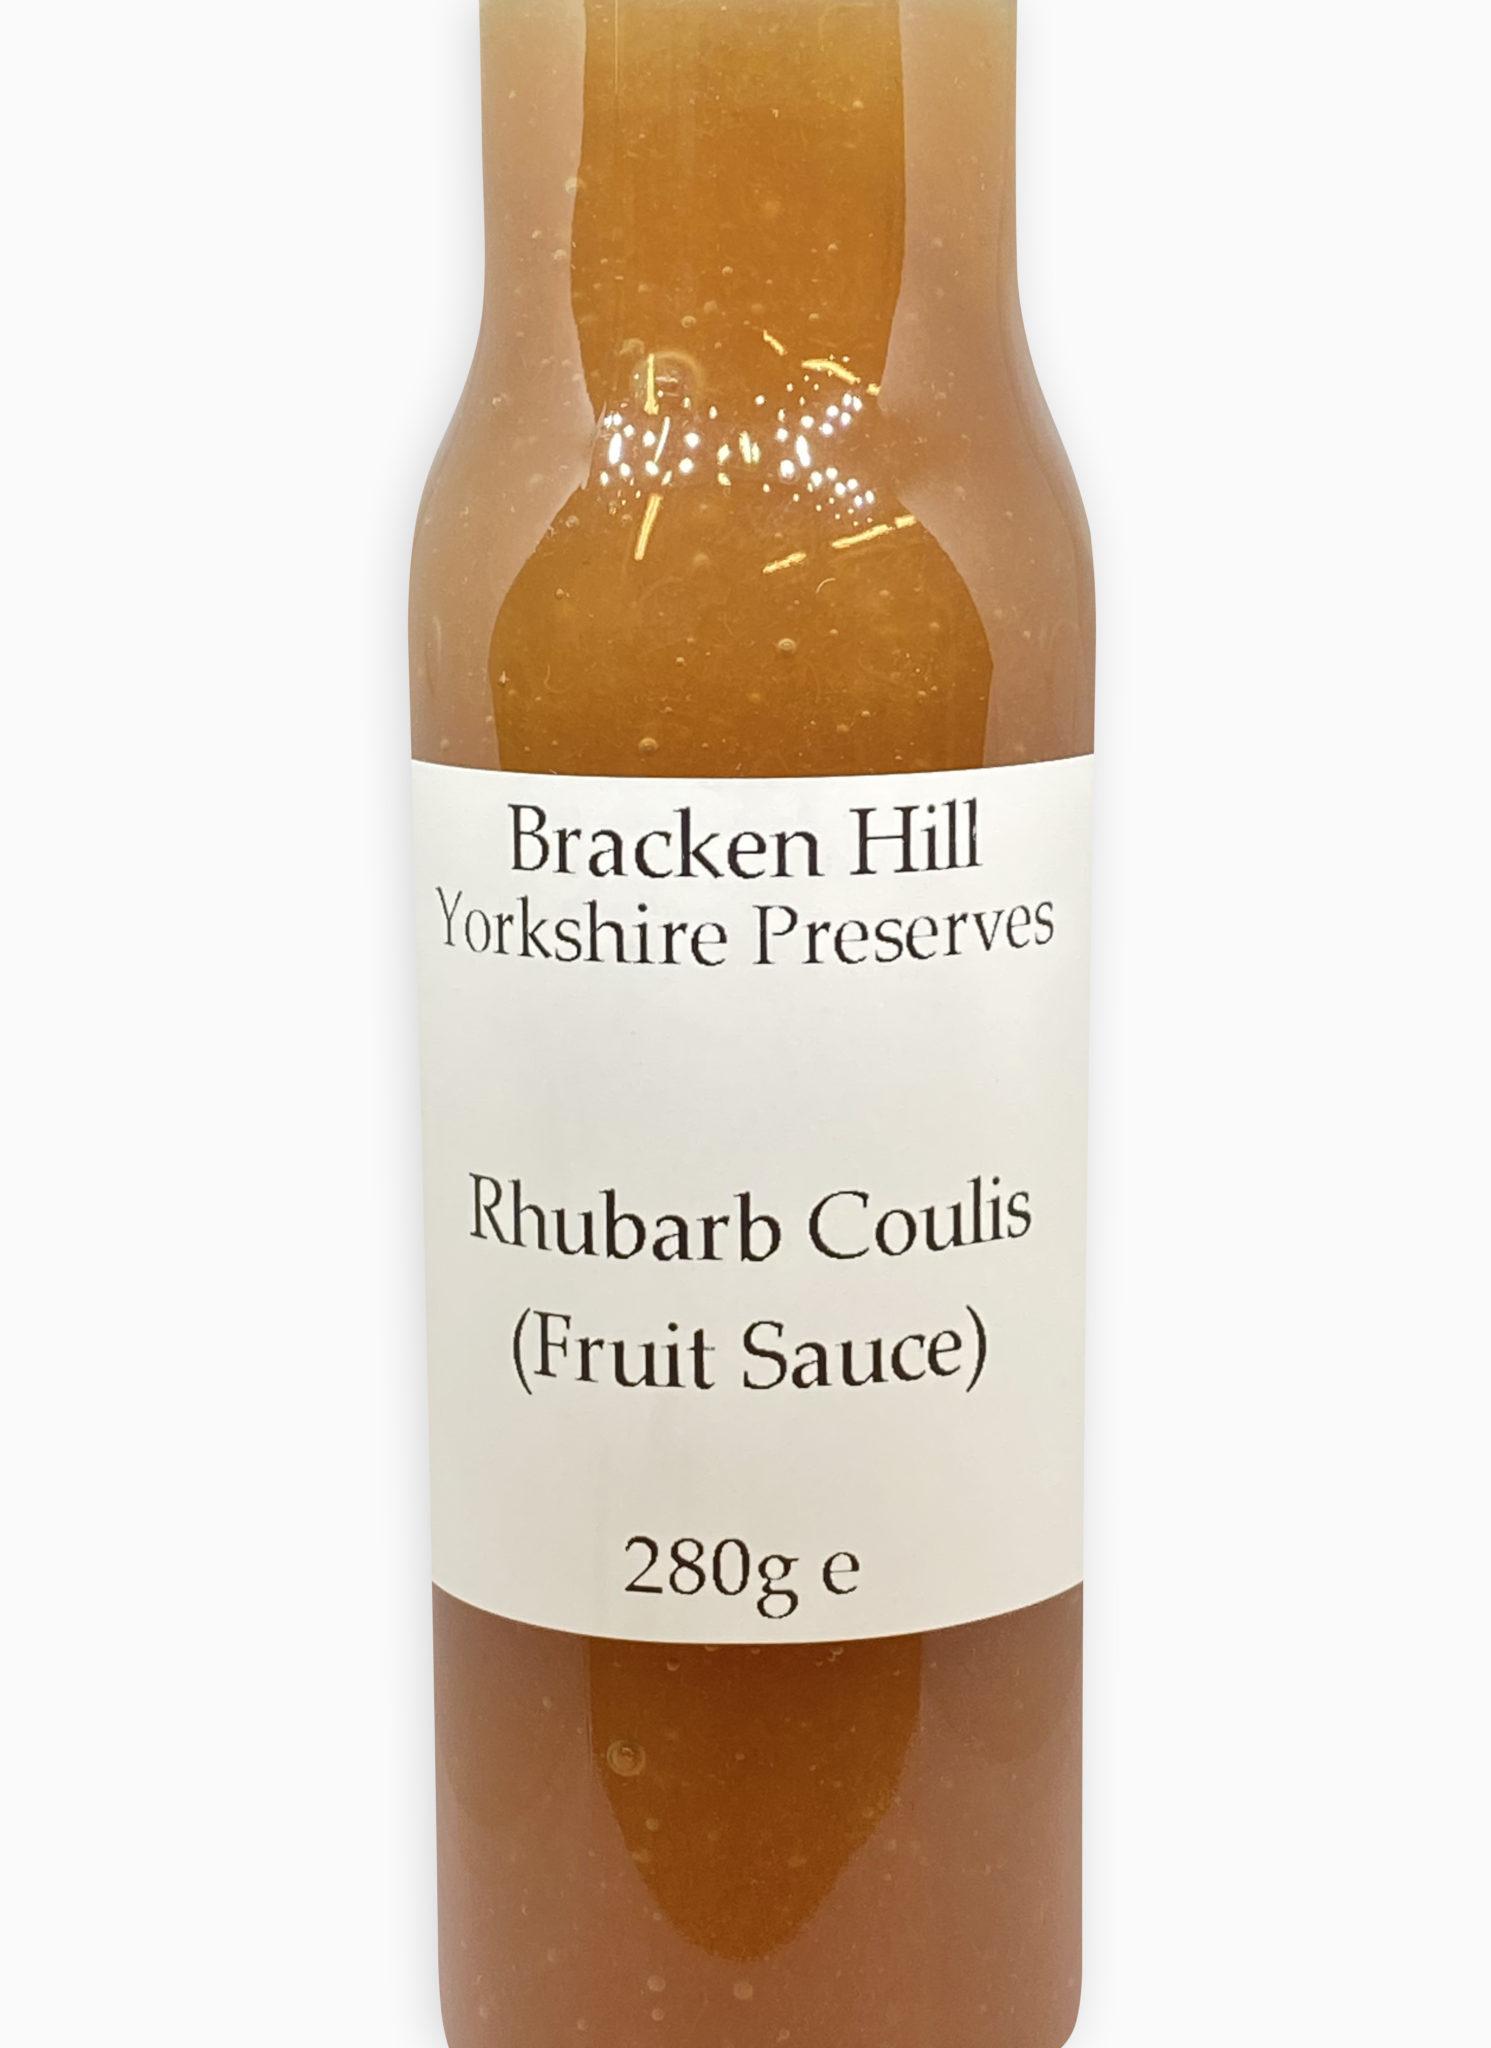 Rhubarb Coulis